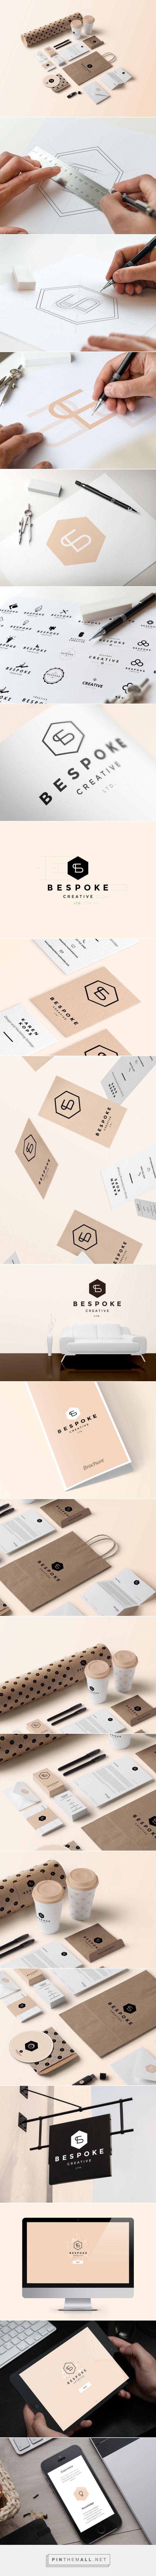 Branding and Website Design: Bespoke Creative by Tomasz Mazurczak